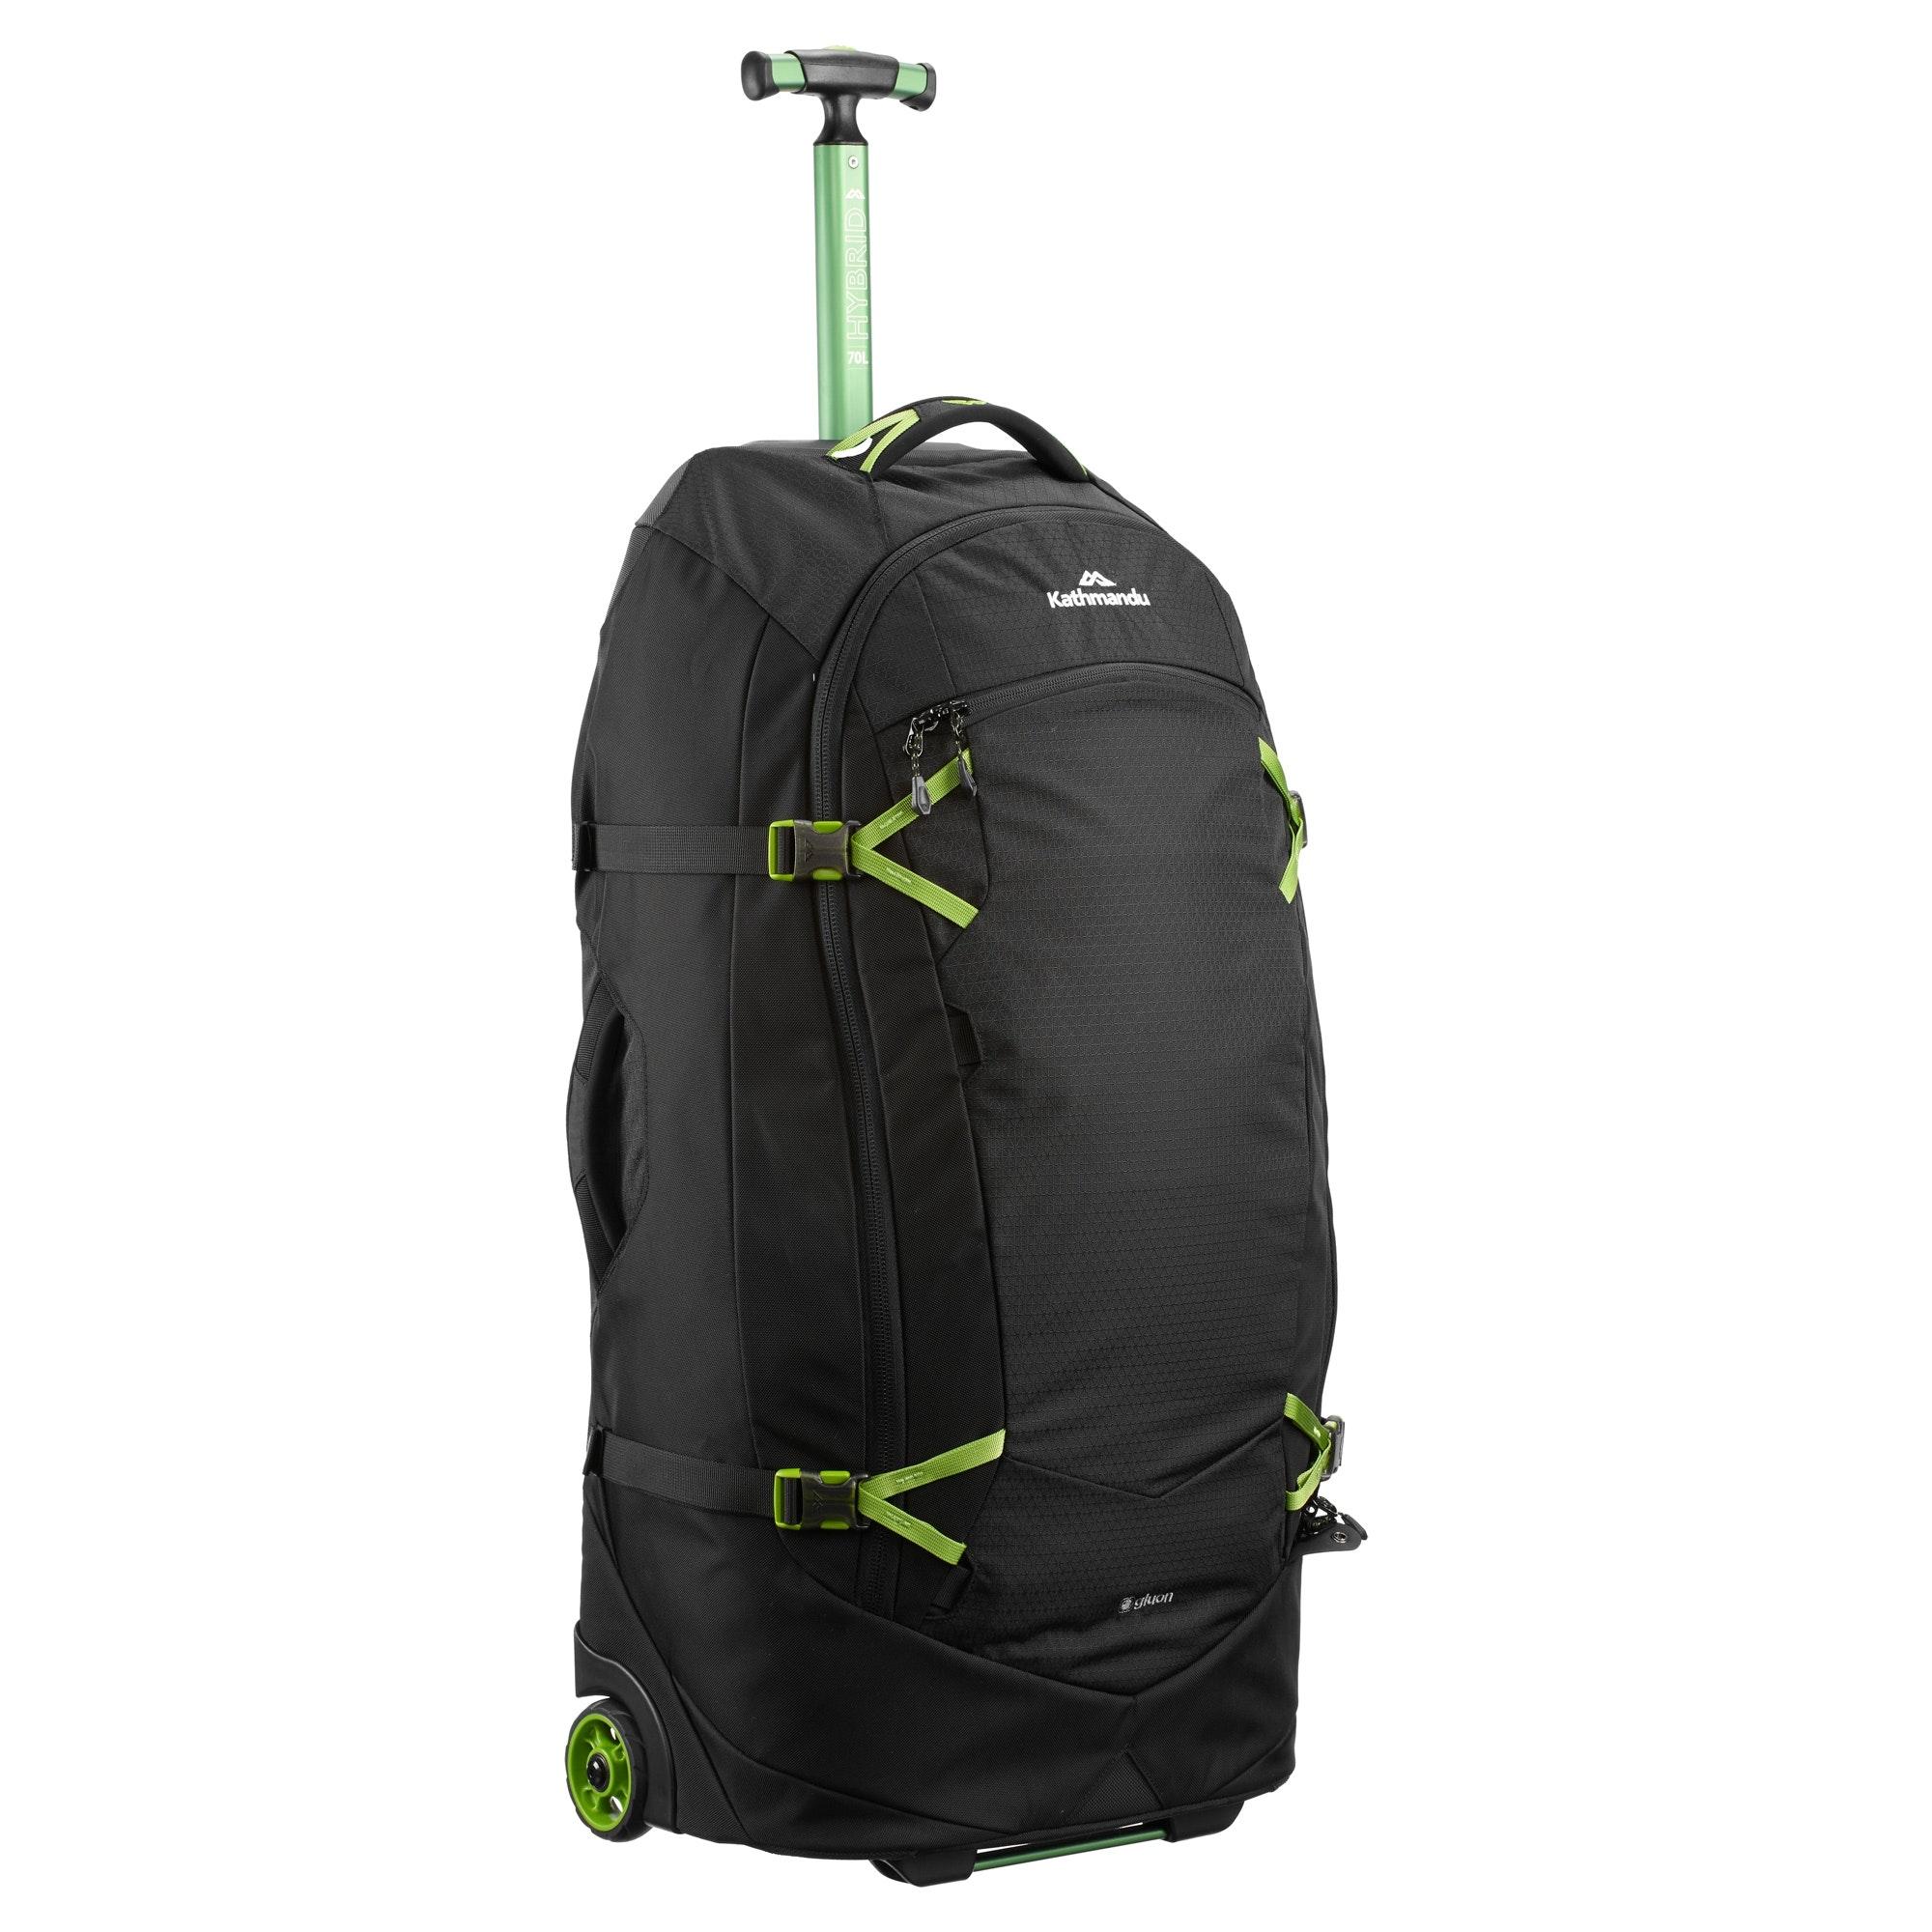 thumbnail 9 - NEW-Kathmandu-Hybrid-70L-Backpack-Wheeled-Handle-Luggage-Bag-Travel-Trolley